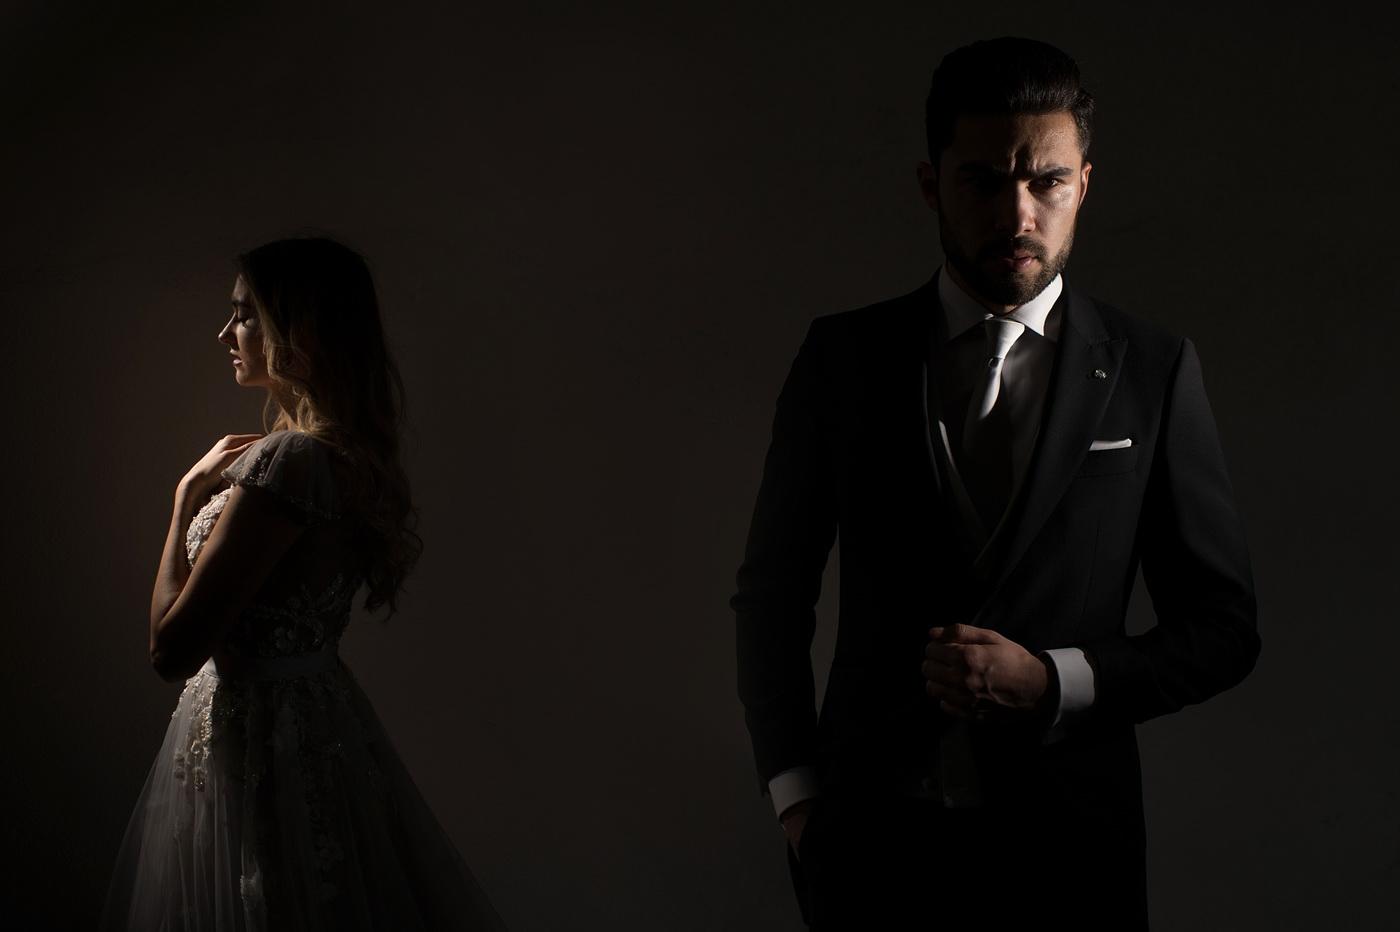 Destination Wedding Photographer_Marian Sterea_219.jpg